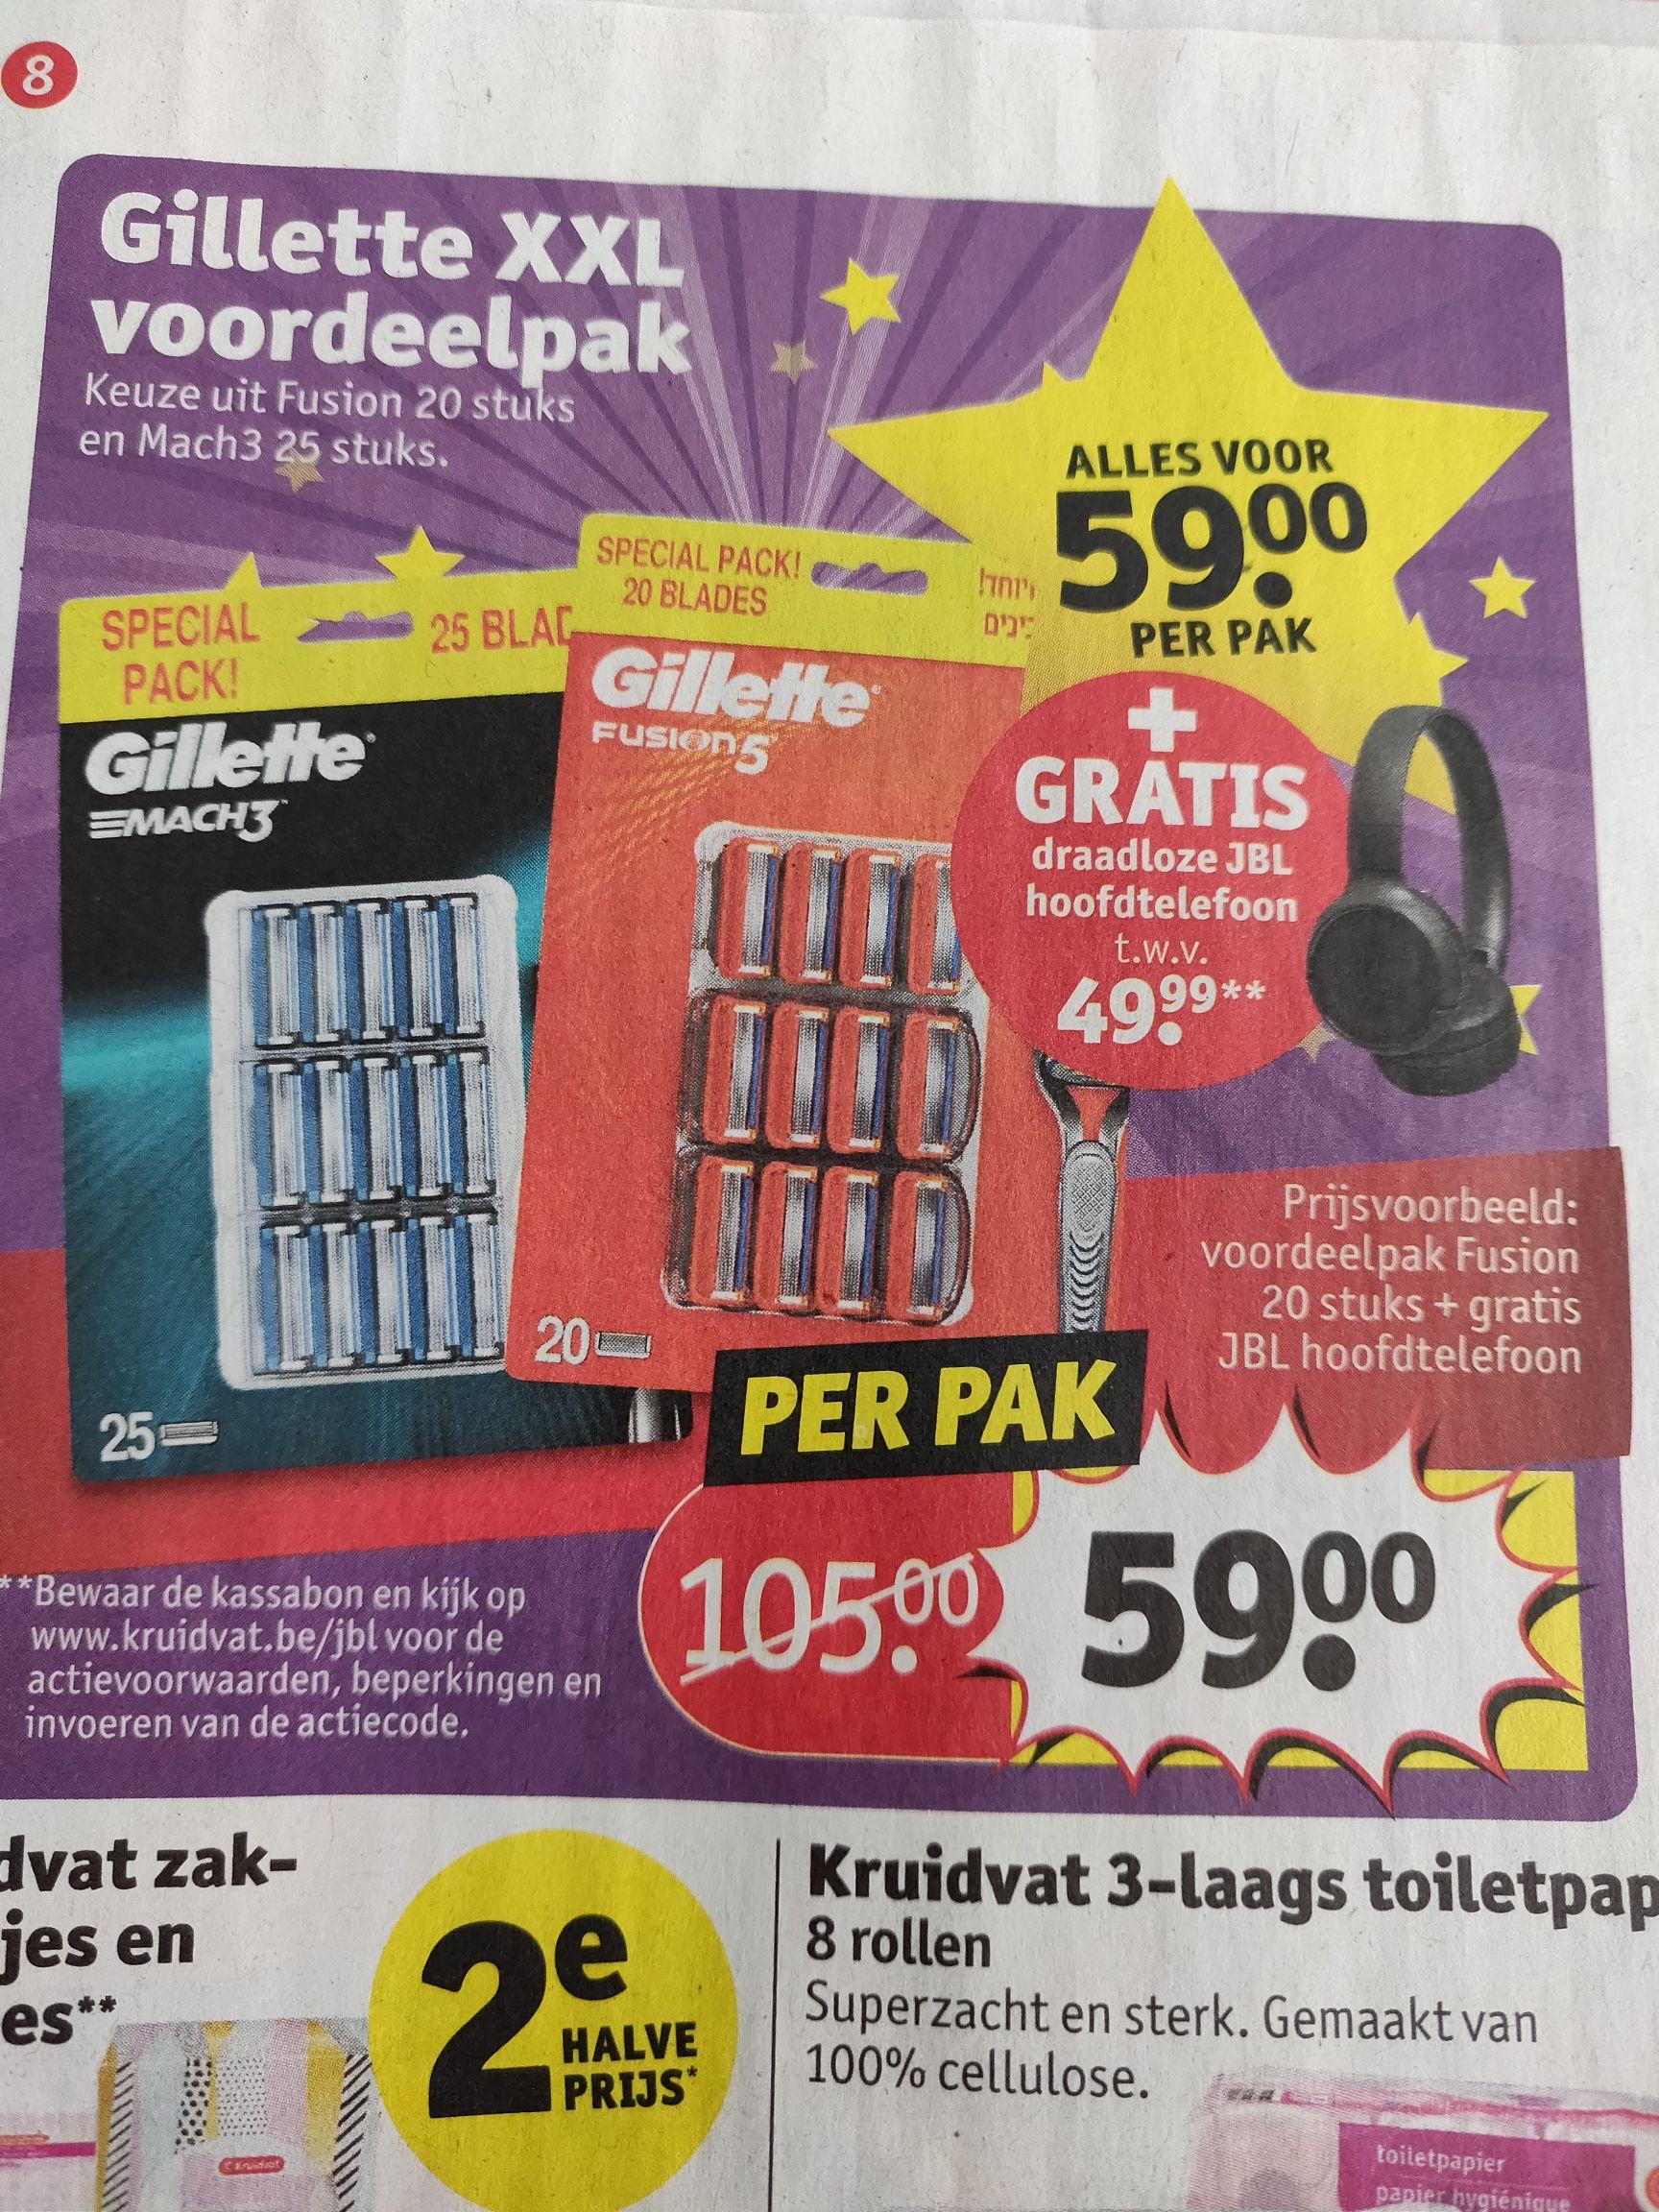 Gilette XXL voordeelpak + GRATIS draadloze hoofdtelefoon twv 49.99 @ Kruidvat België